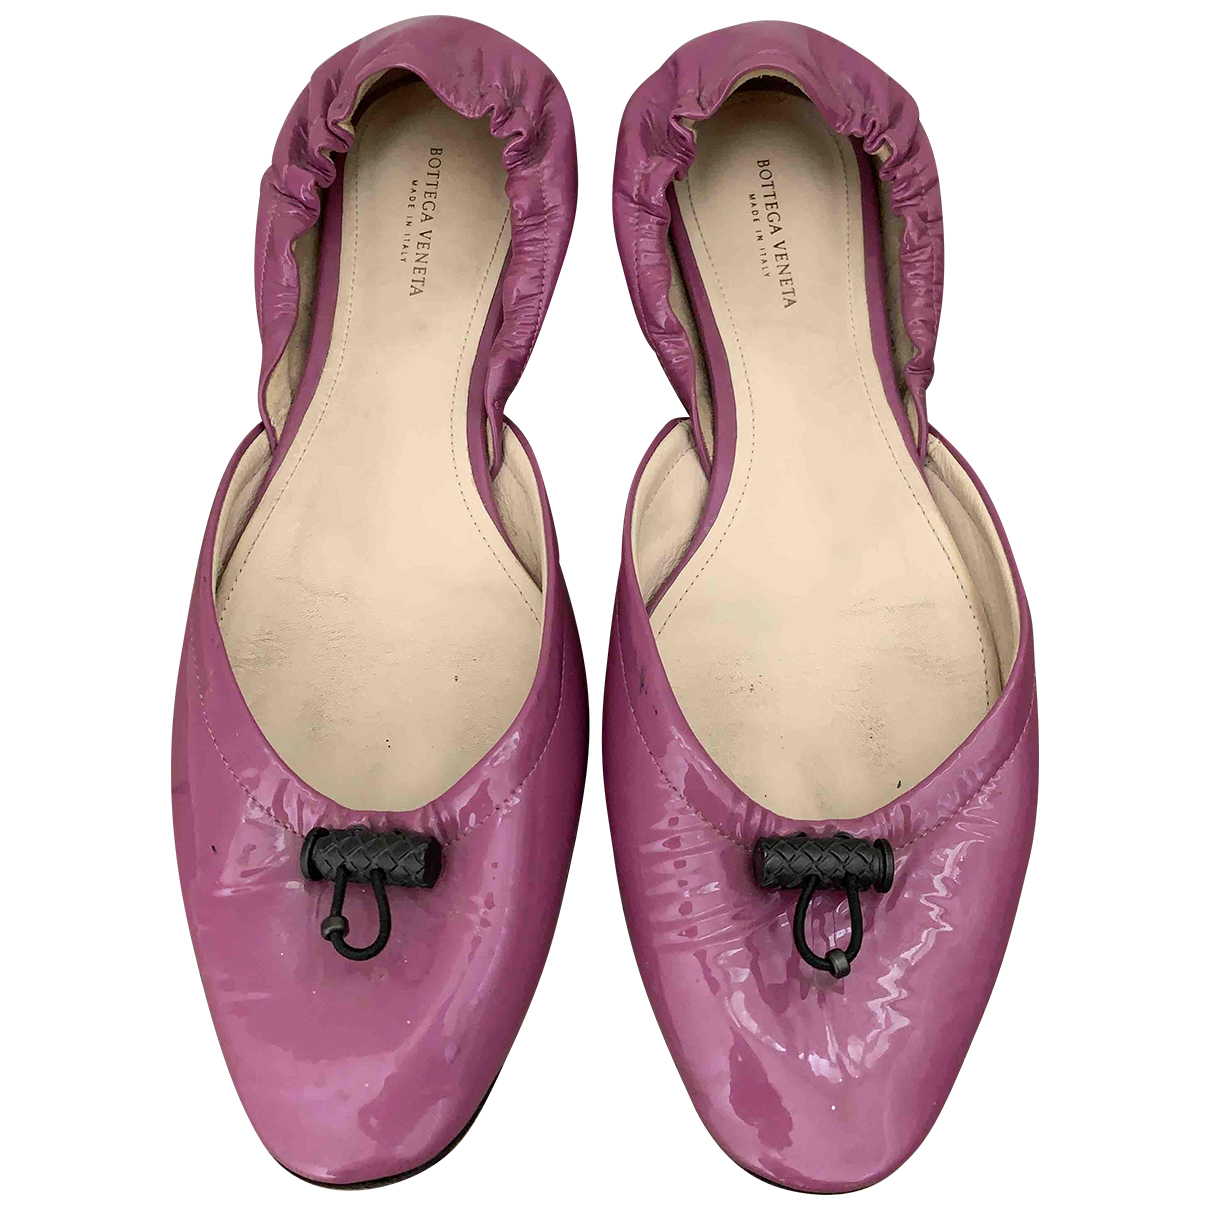 Bottega Veneta \N Pink Patent leather Ballet flats for Women 38.5 EU